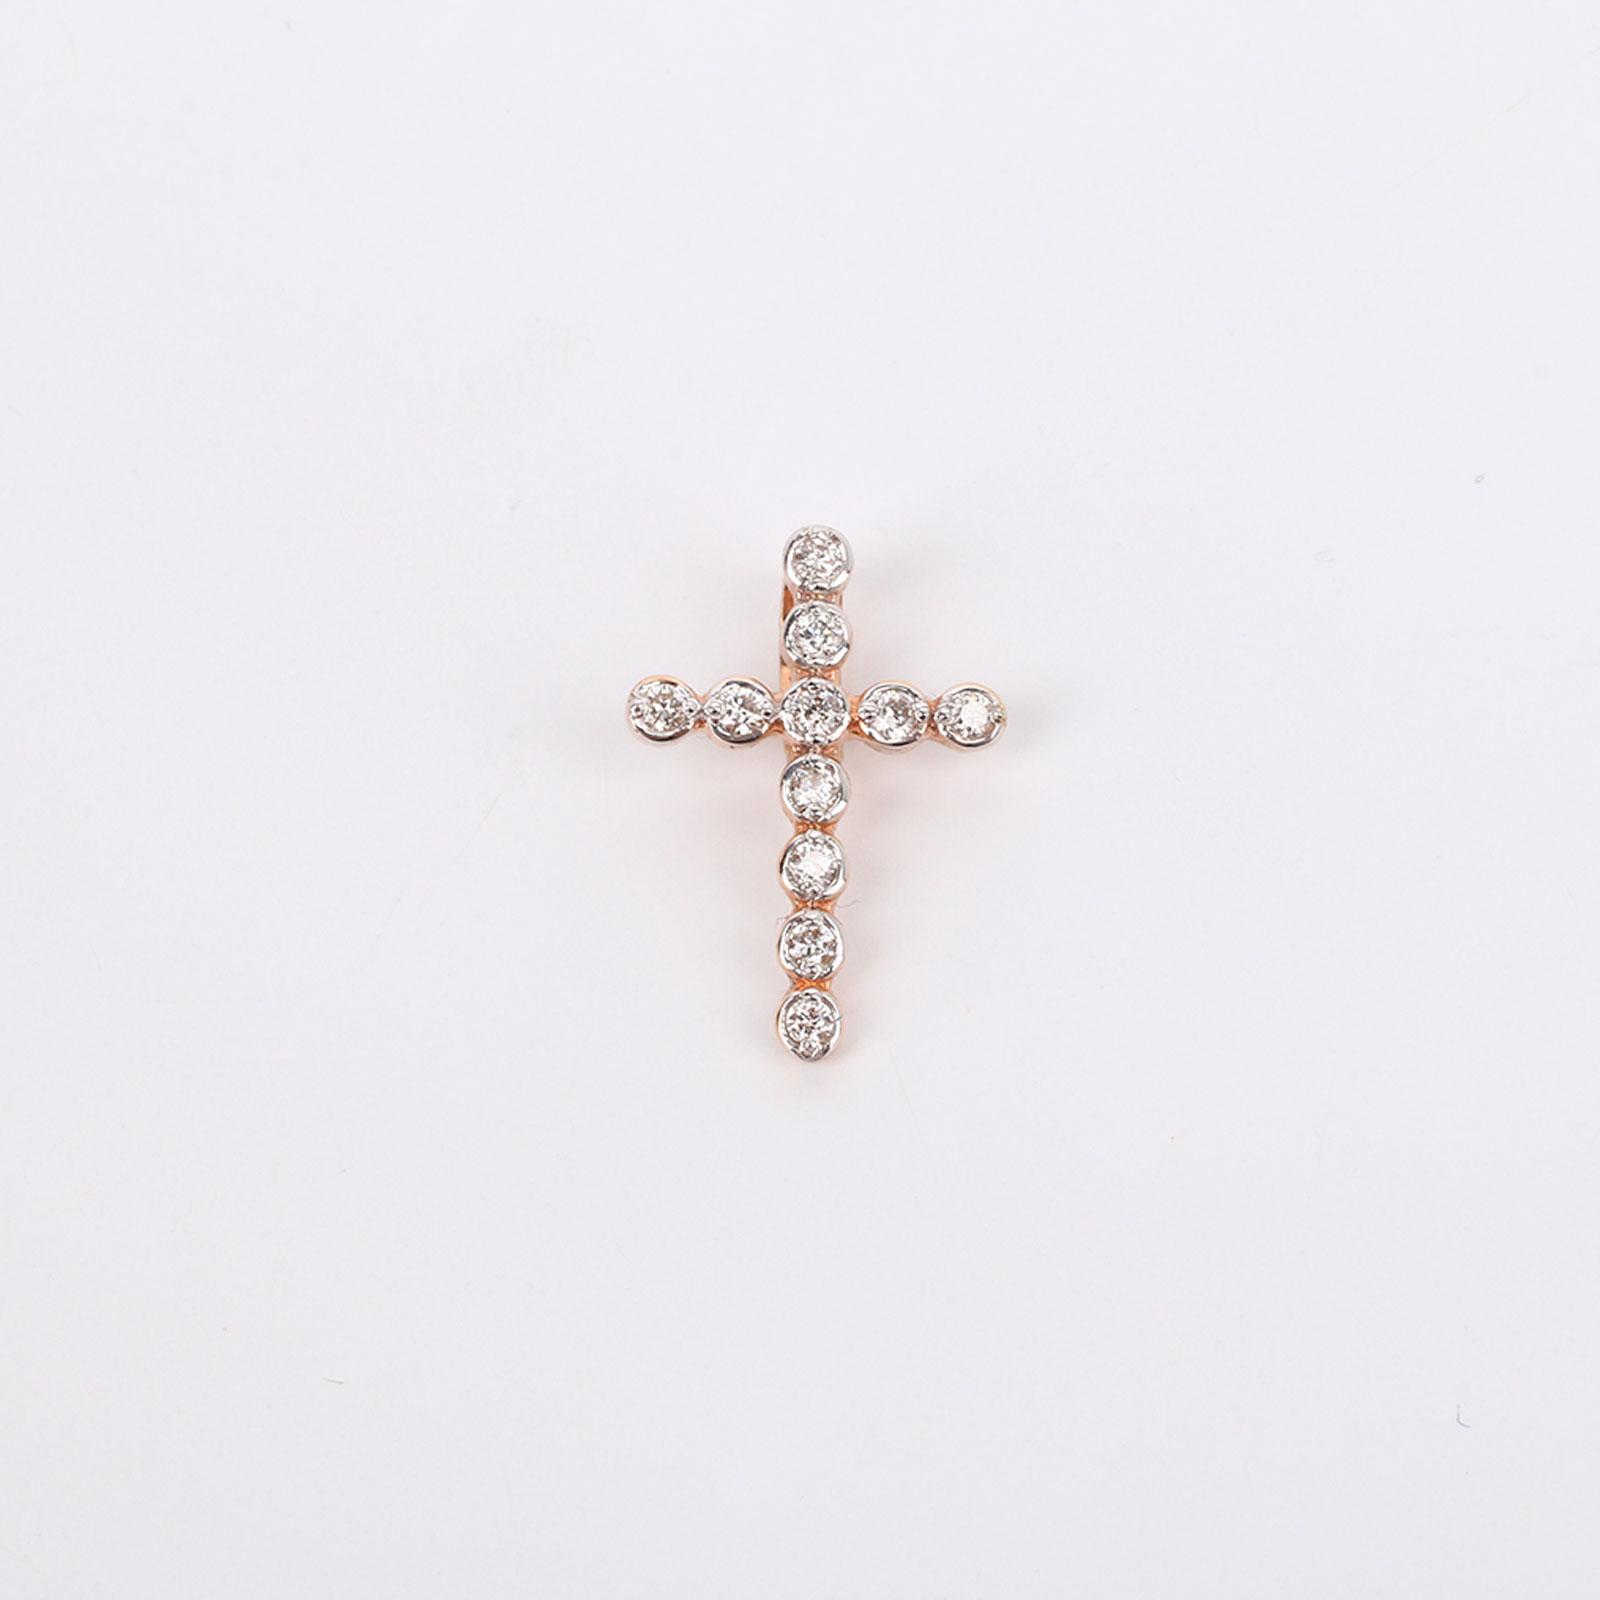 Крест из красного золота с бриллиантами